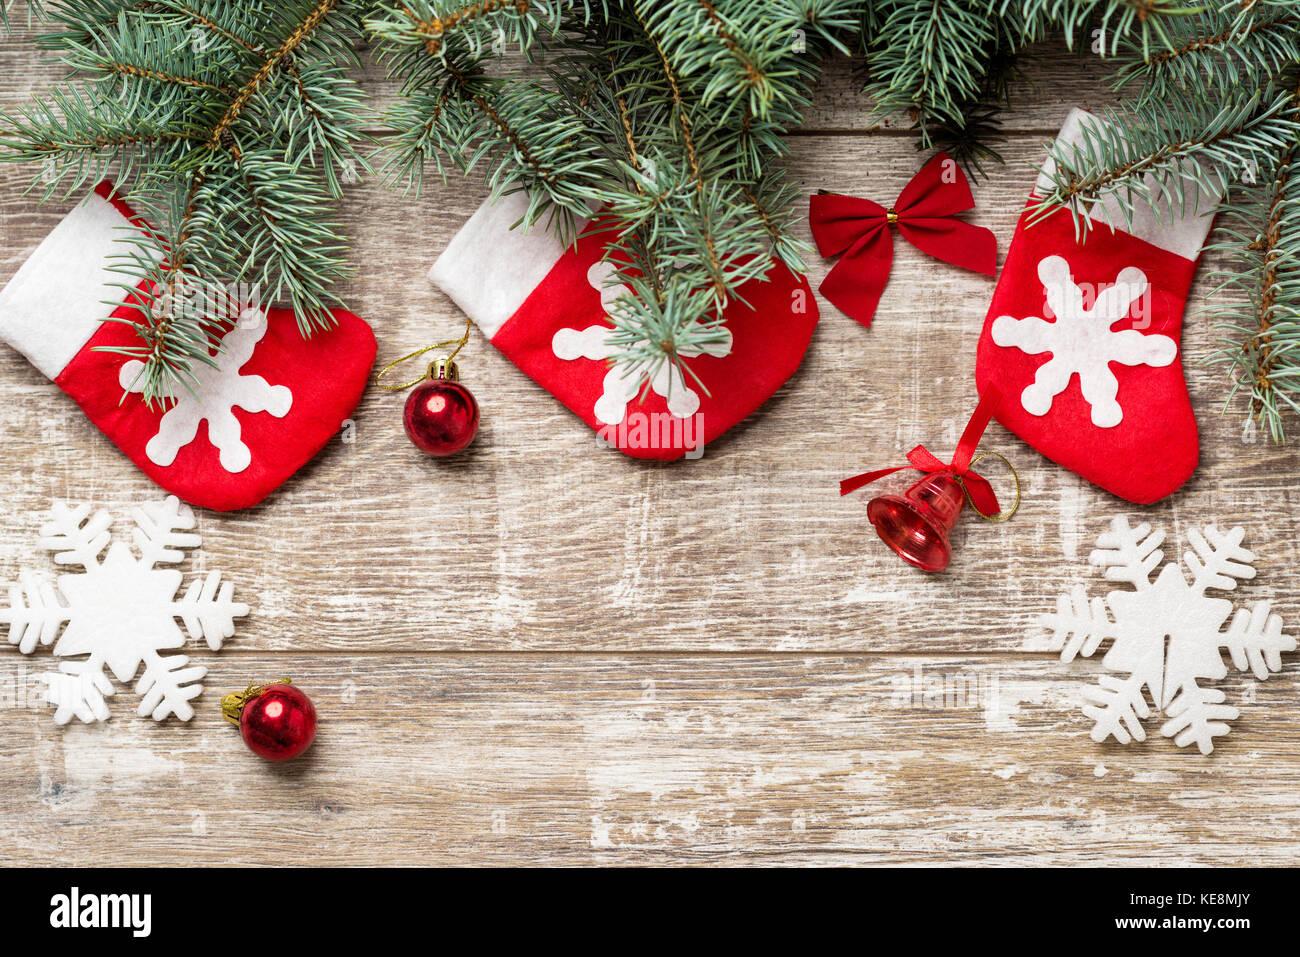 Christmas backgrounds 2018 Stock Photo: 163690323 - Alamy